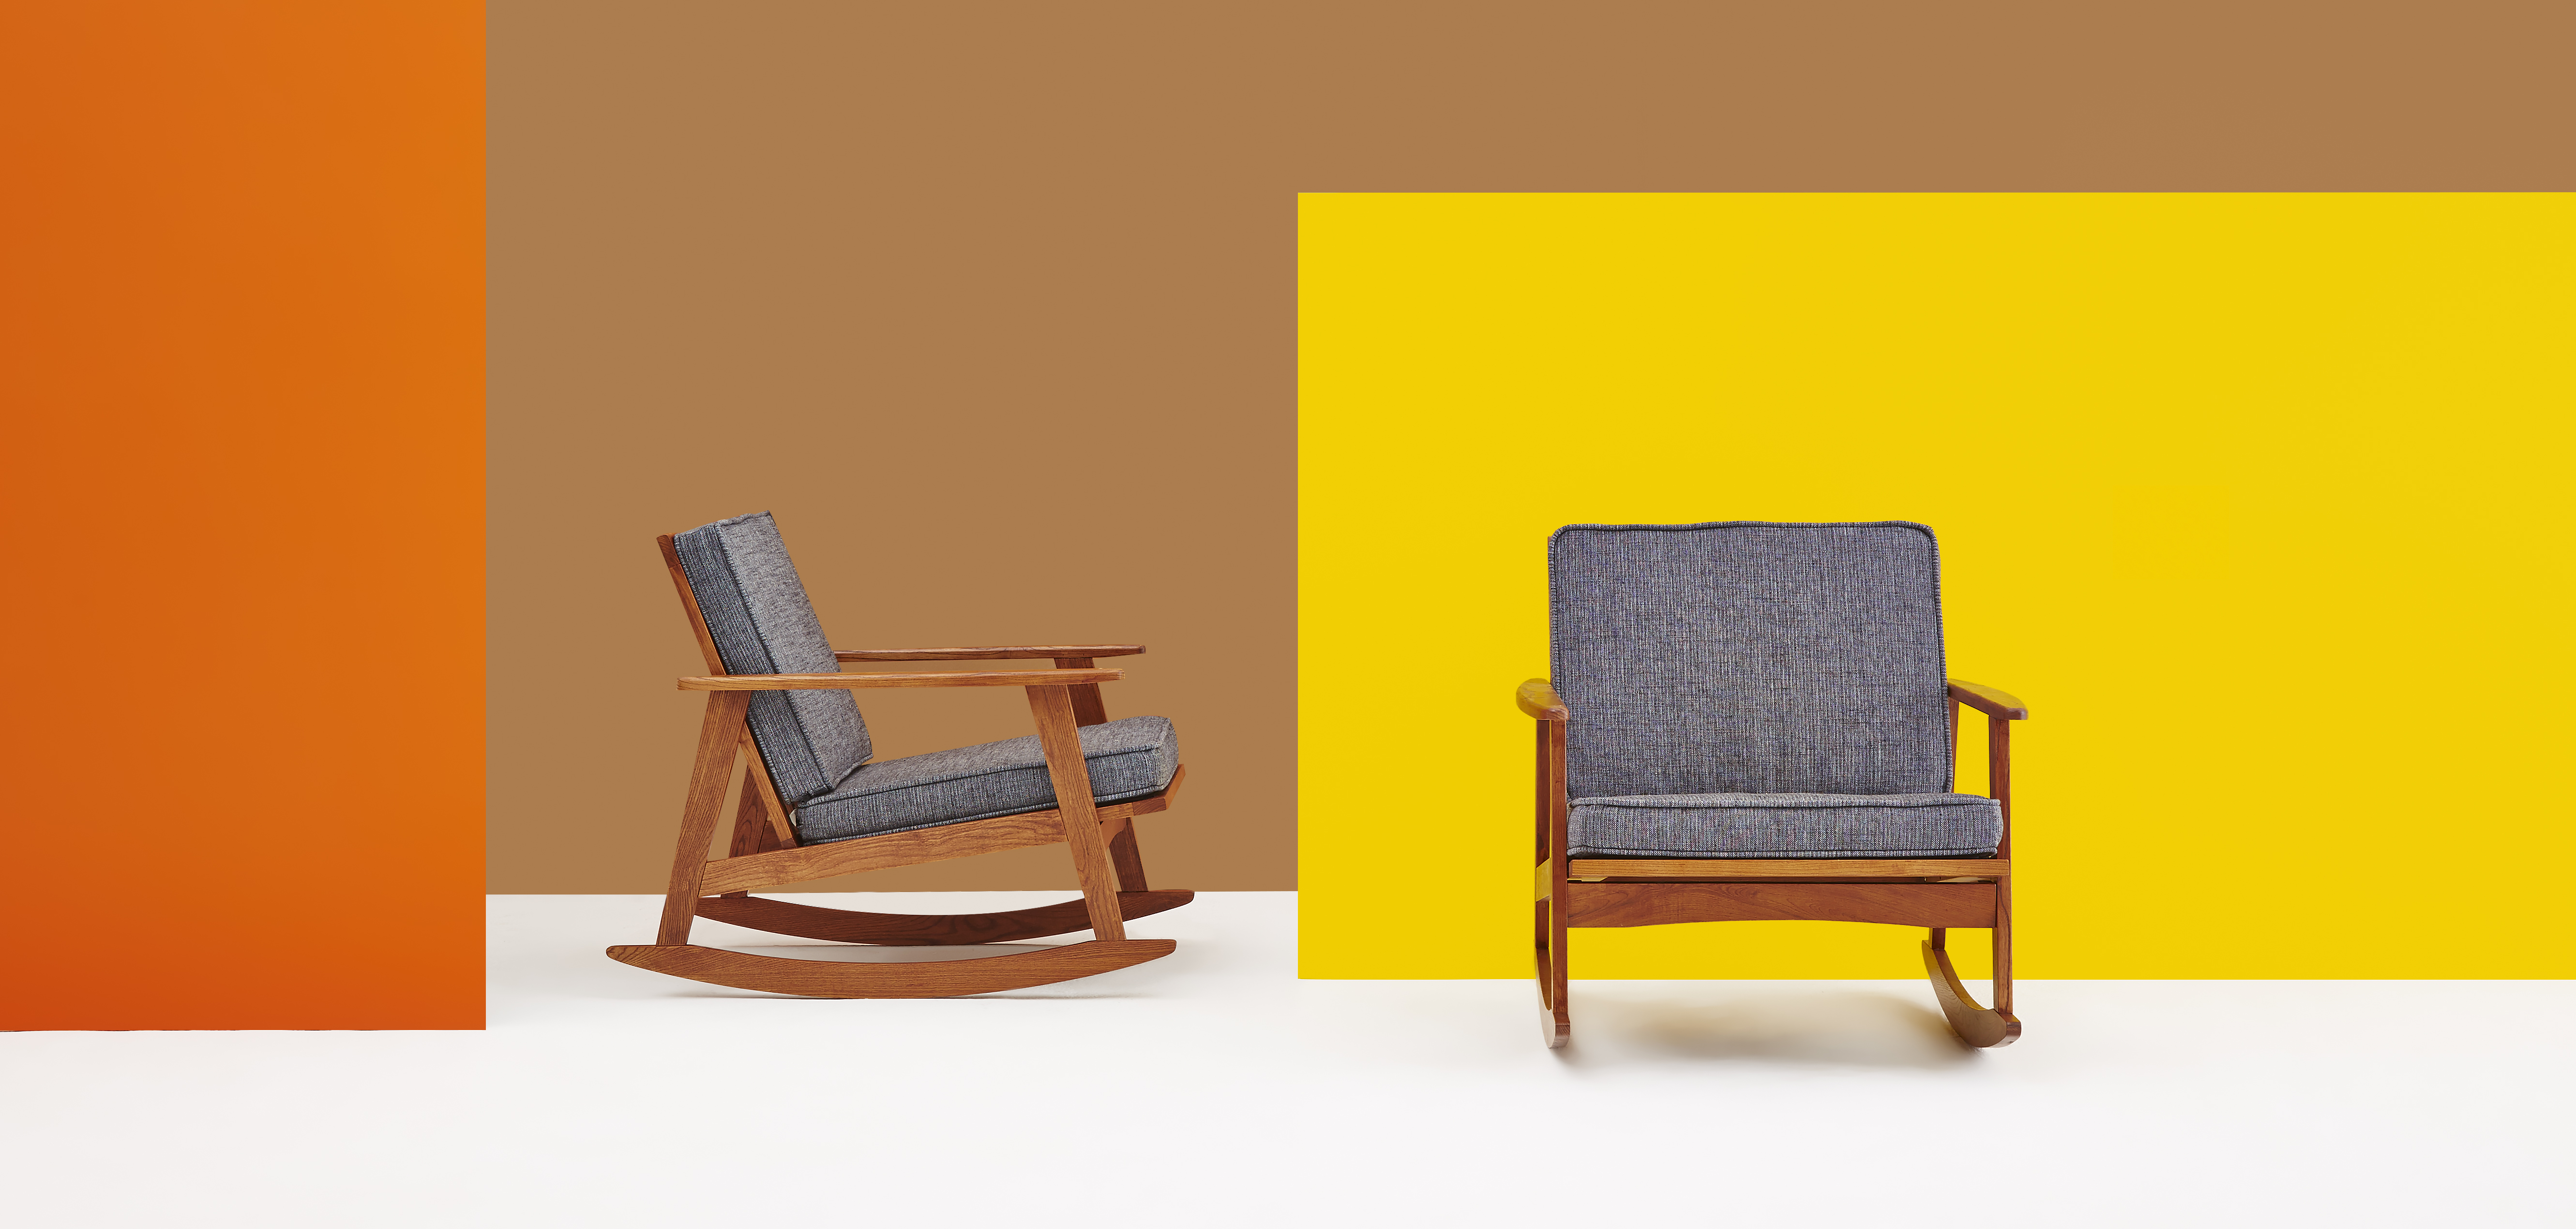 HW_Wk28_Modern Retro_Furniture_Headline.jpg